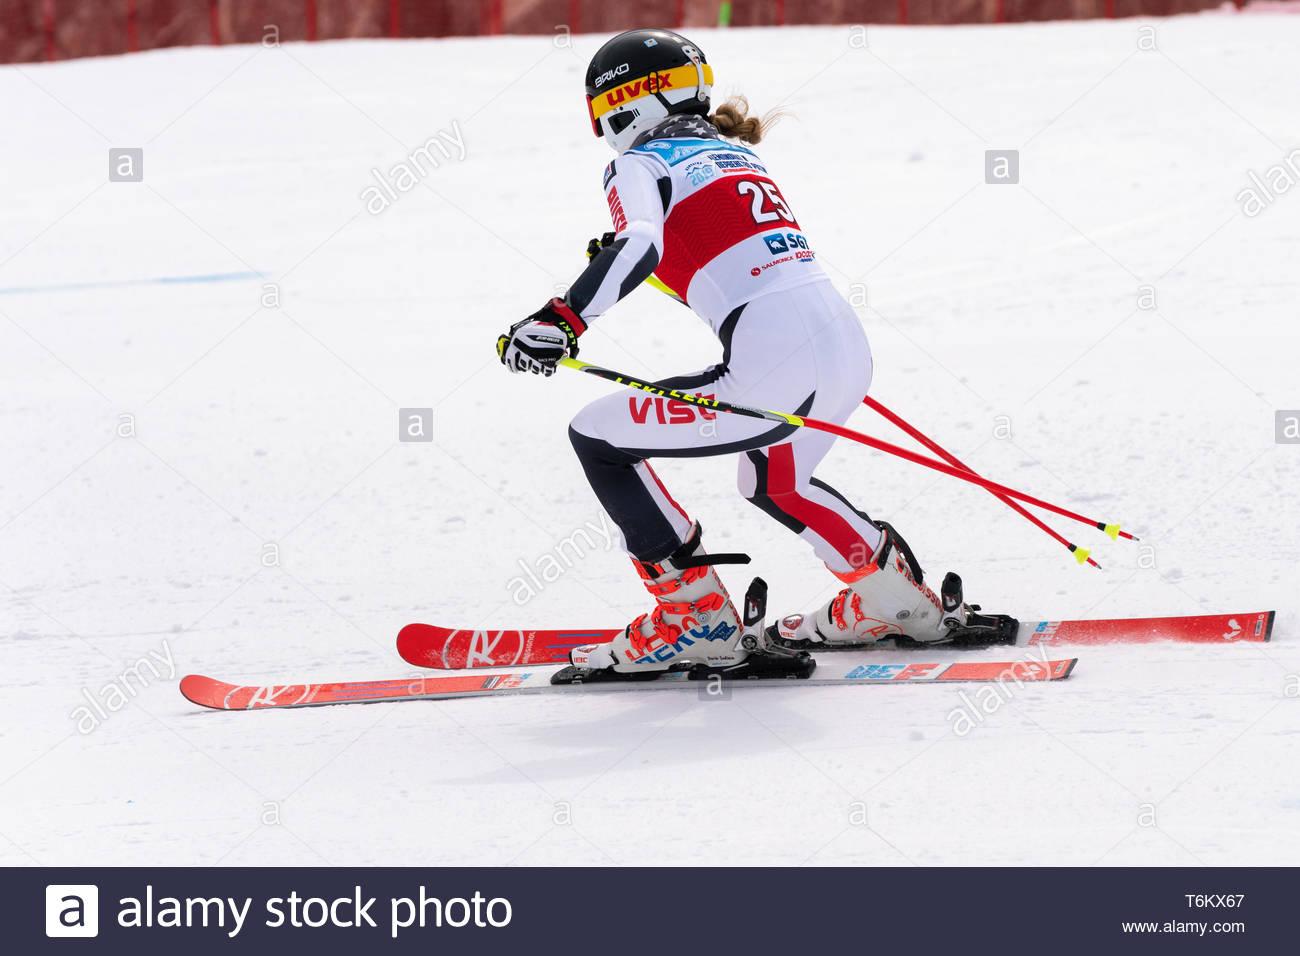 KAMCHATKA PENINSULA, RUSSIA - APRIL 2, 2019: Mountain skier Sautieva Daria (Moscow) skiing down mount slope. Russian Women's Alpine Skiing Cup, Intern - Stock Image